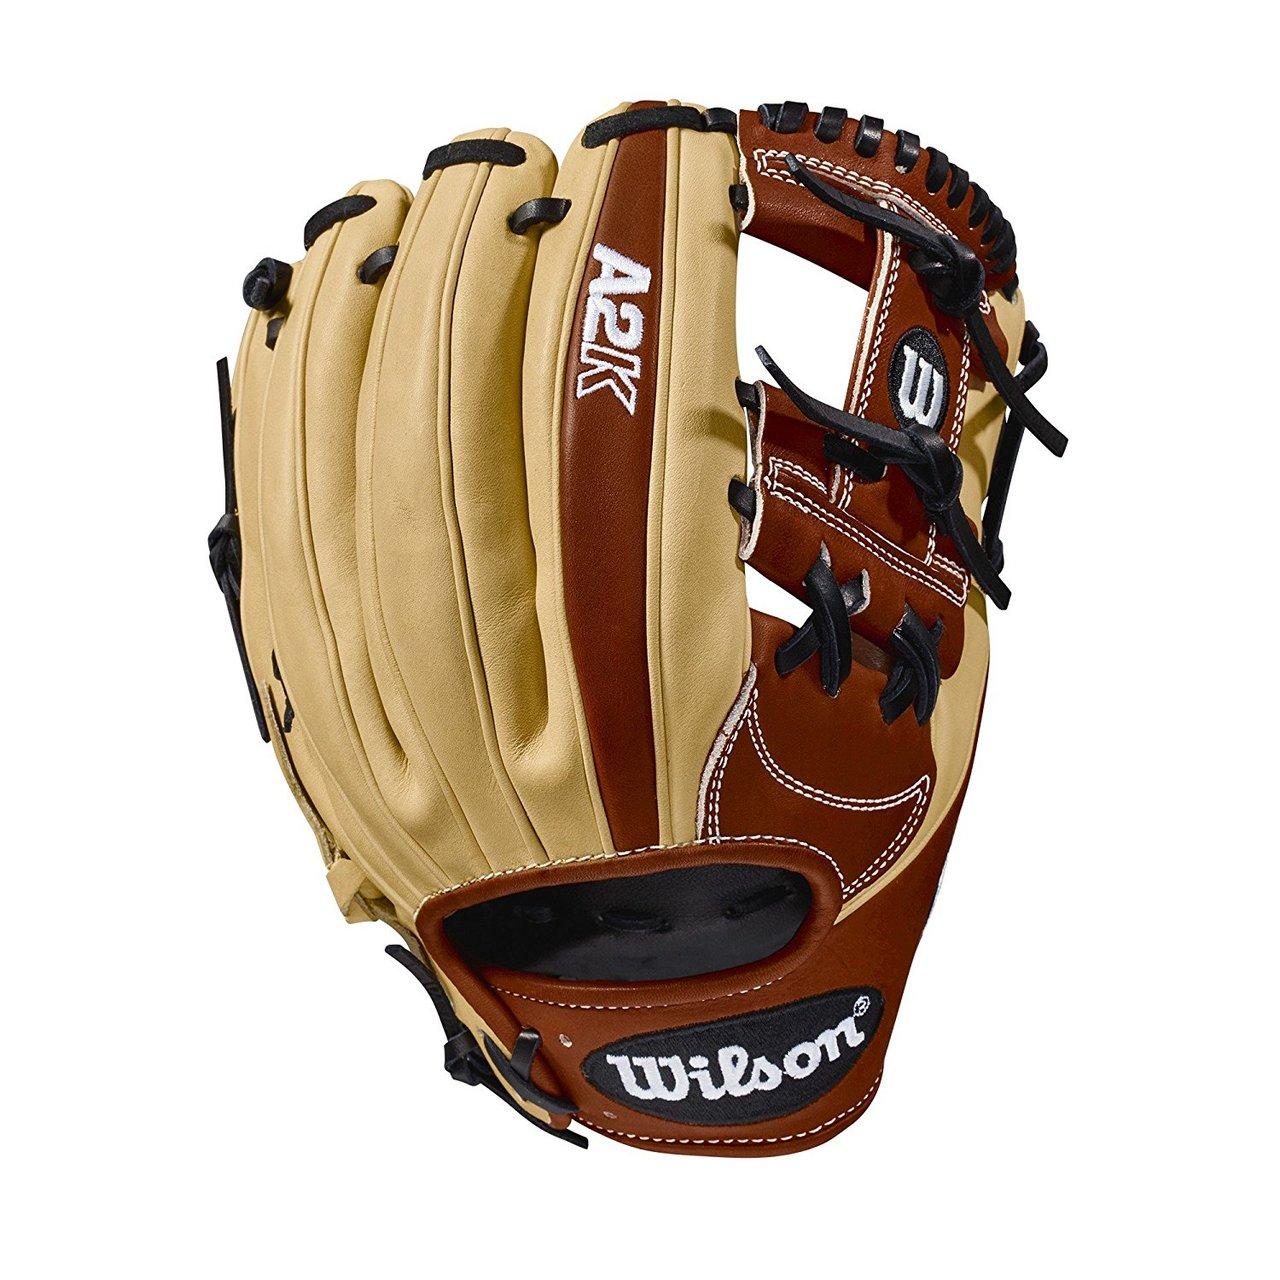 wilson-2018-a2k-1787-infield-baseball-glove-right-hand-throw-11-75-inch WTA2KRB181787-RightHandThrow Wilson 887768592004